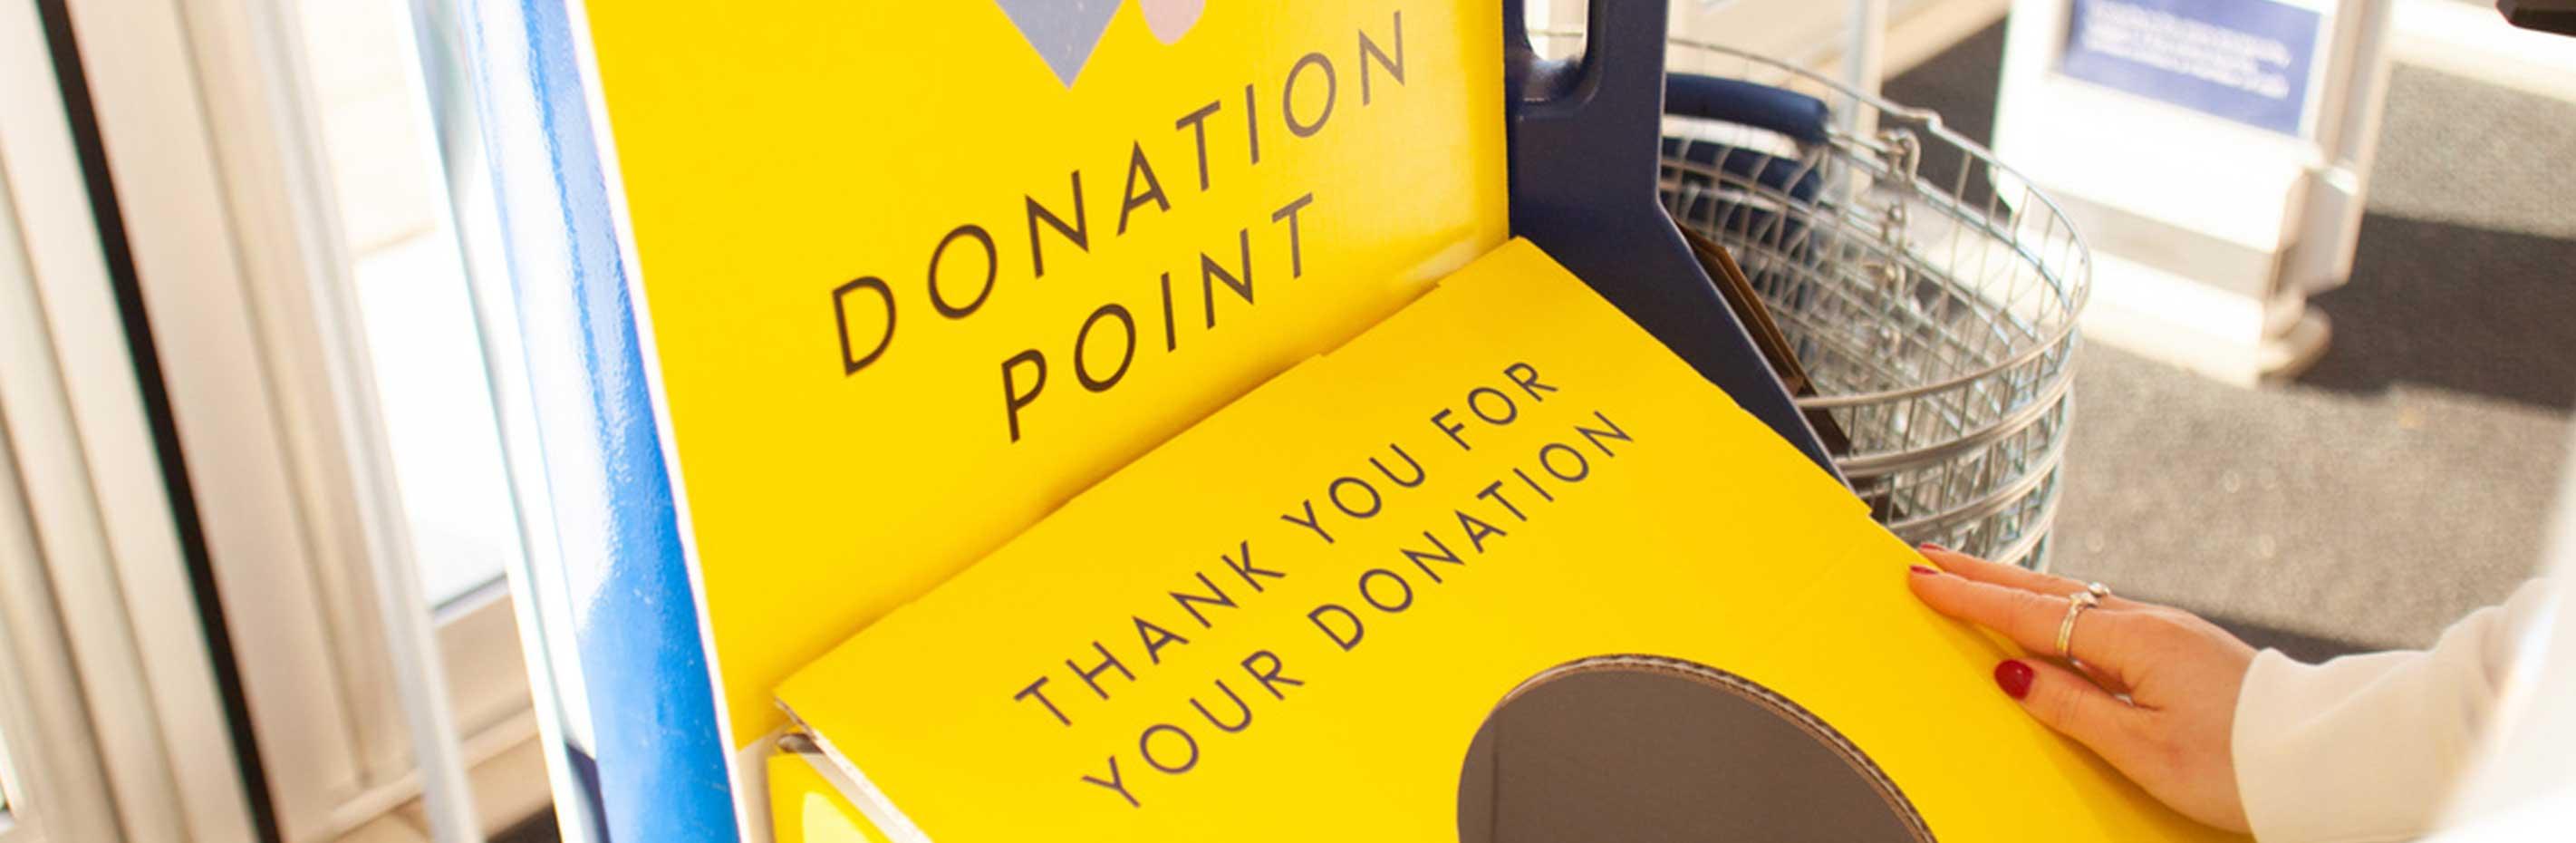 Donate: The Hygiene Bank